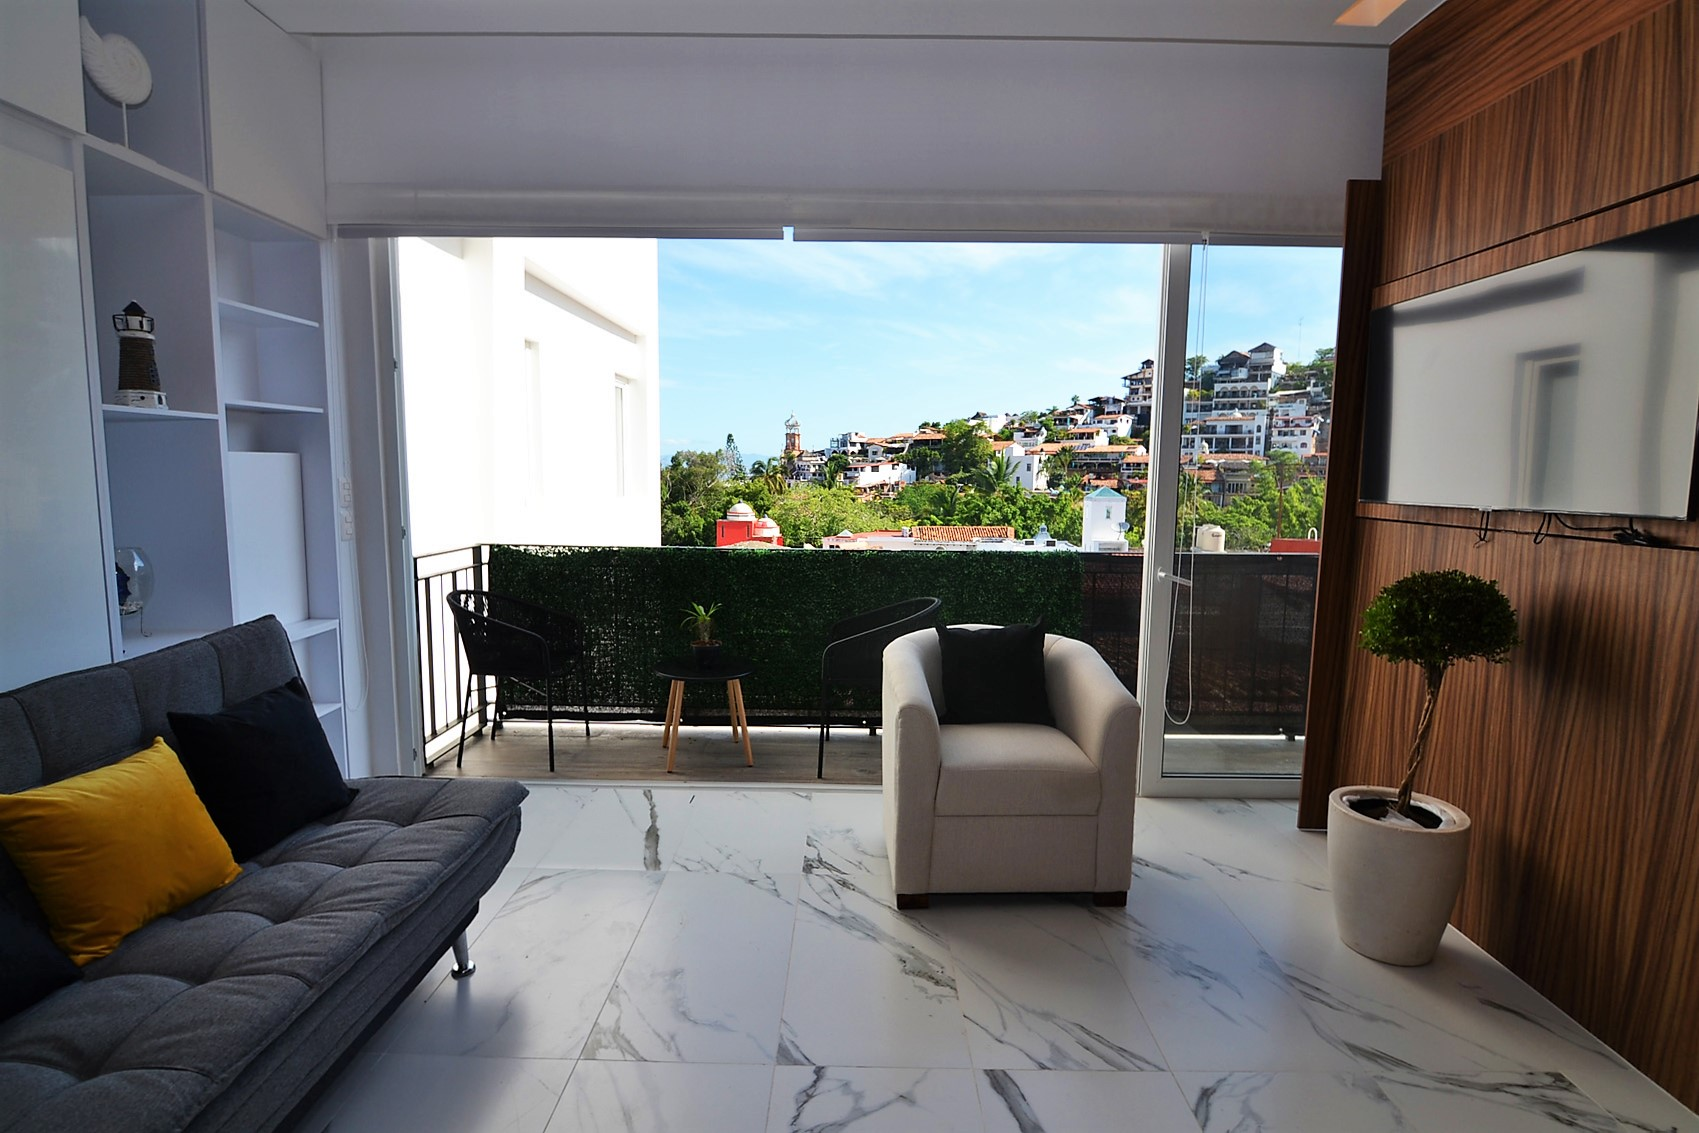 Condo Avida Super Studio 4 - Puerto Vallarta Furnished Condo Romantic Zone (46)